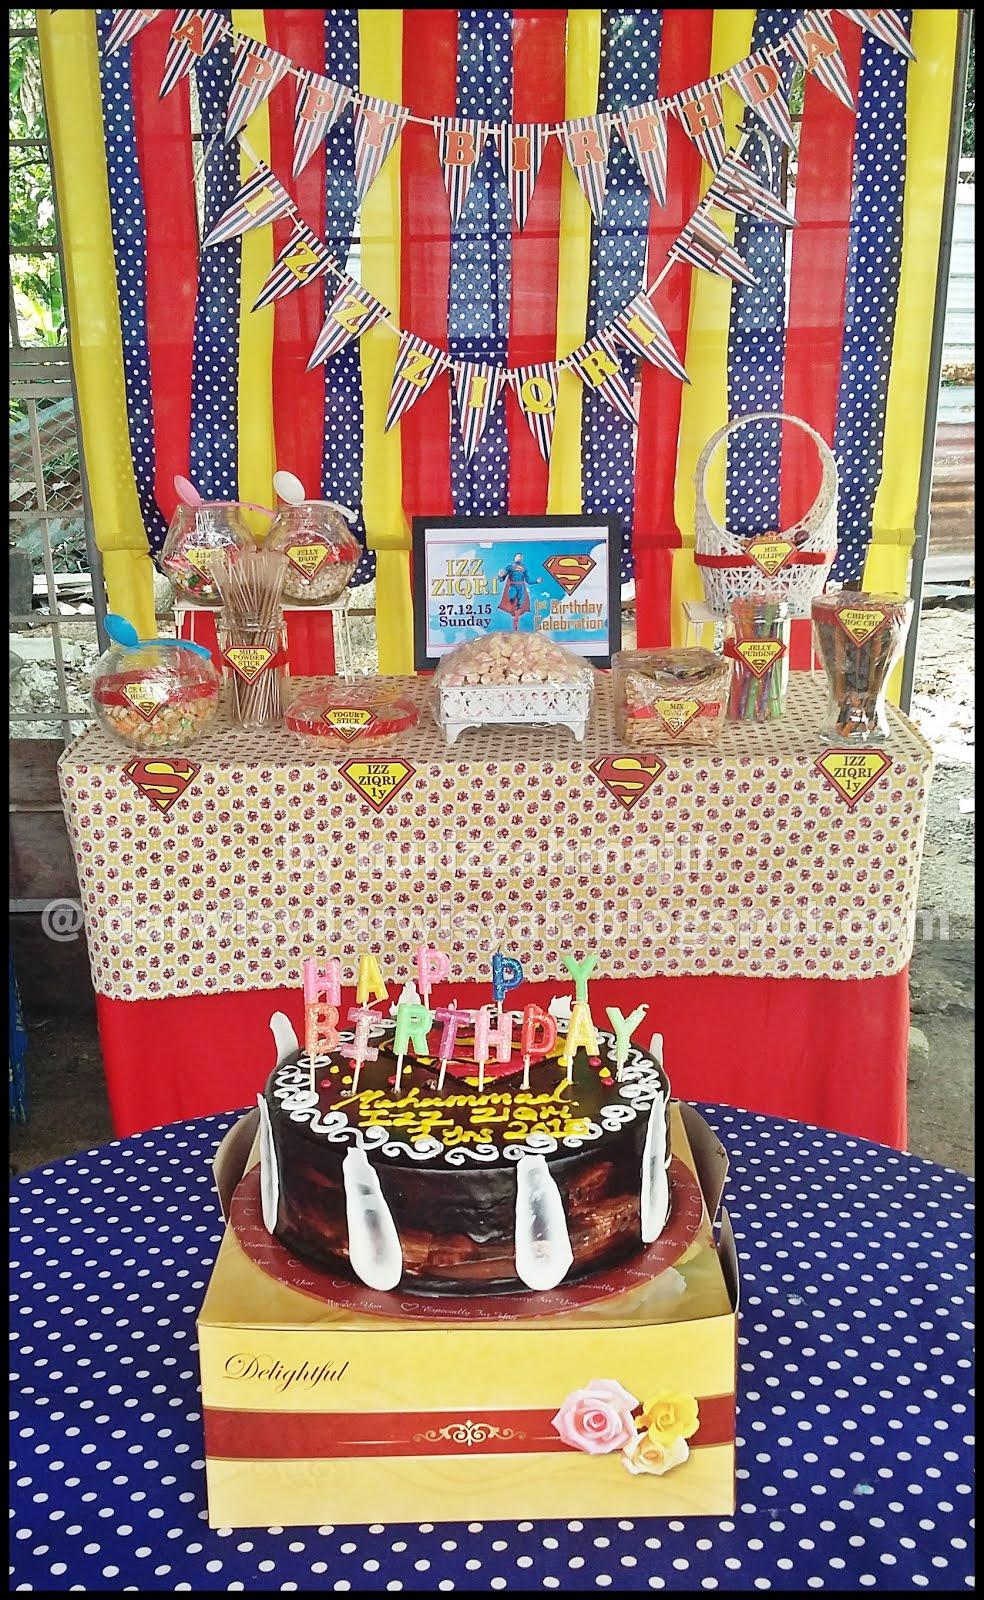 Birthday Celebration Izz Ziqri | 27/12/2015 @ Sungai Besi, Kuala Lumpur